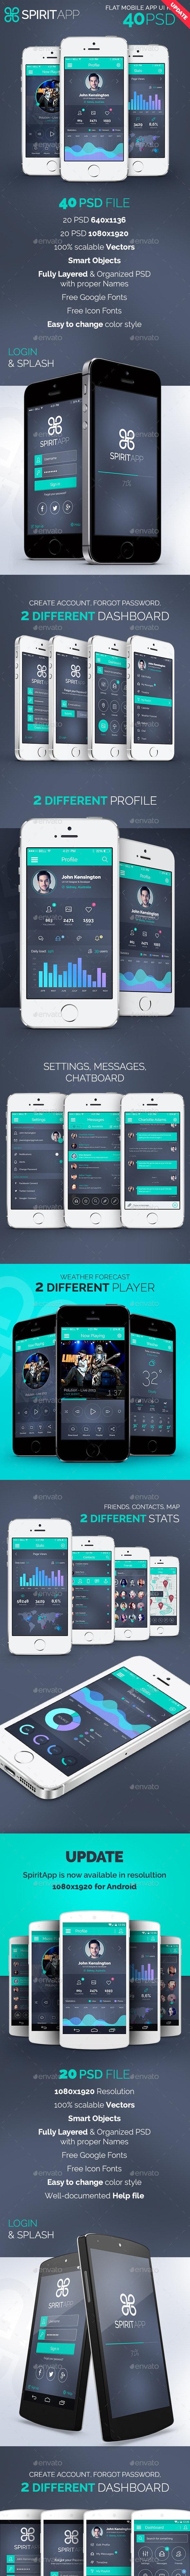 SpiritApp - Flat Mobile Design UI Kit by creakits   GraphicRiver